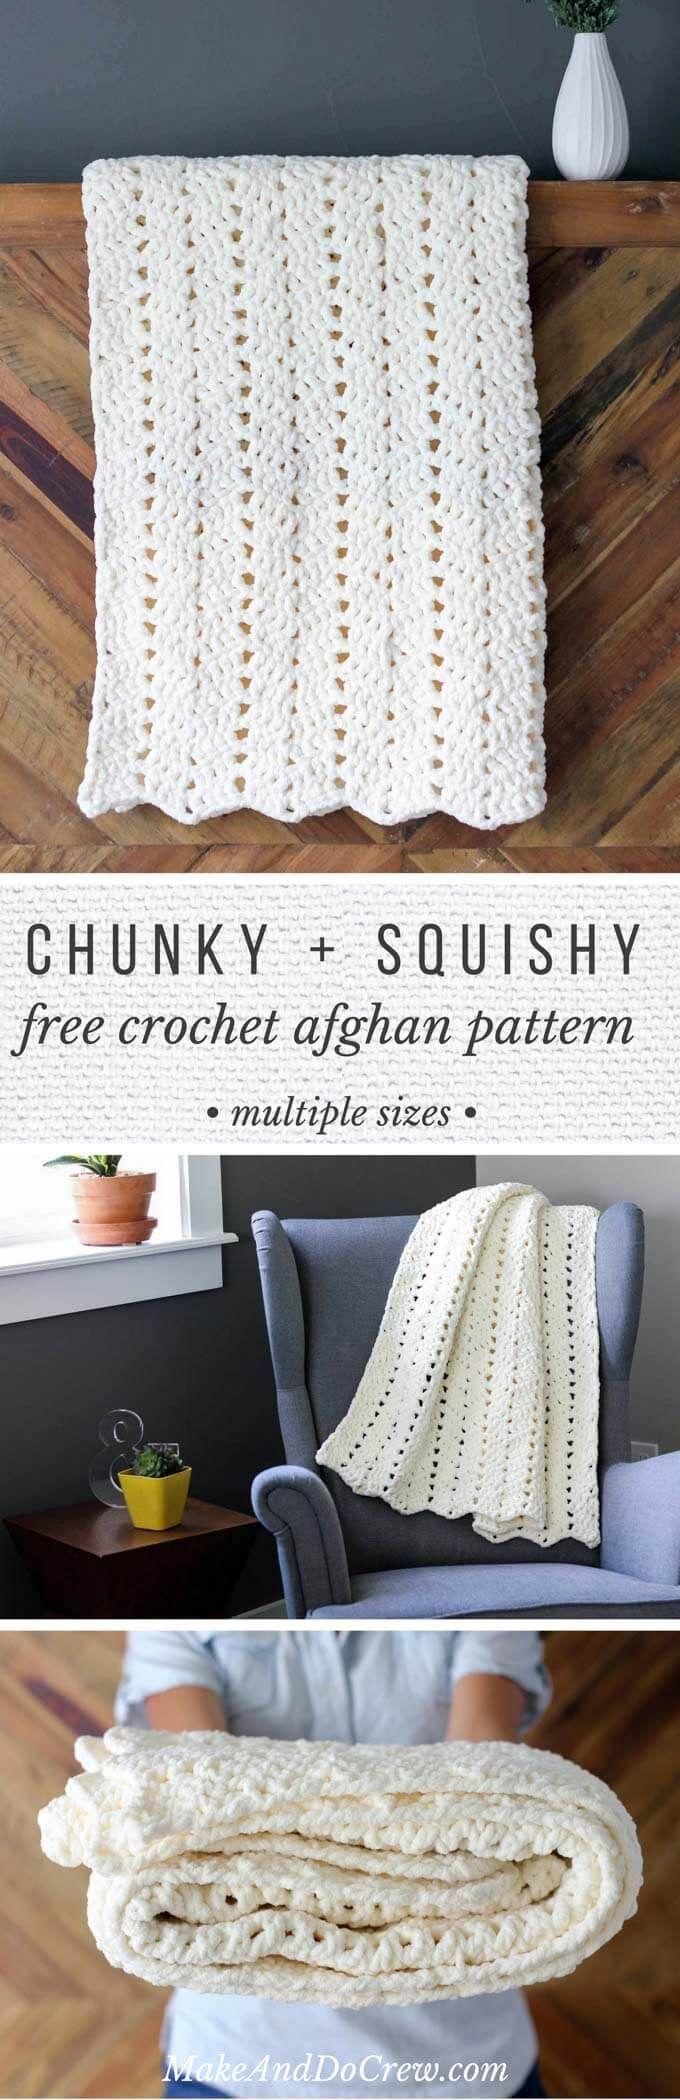 Free modern chunky crochet blanket pattern beginner friendly free modern chunky crochet blanket pattern beginner friendly bankloansurffo Gallery